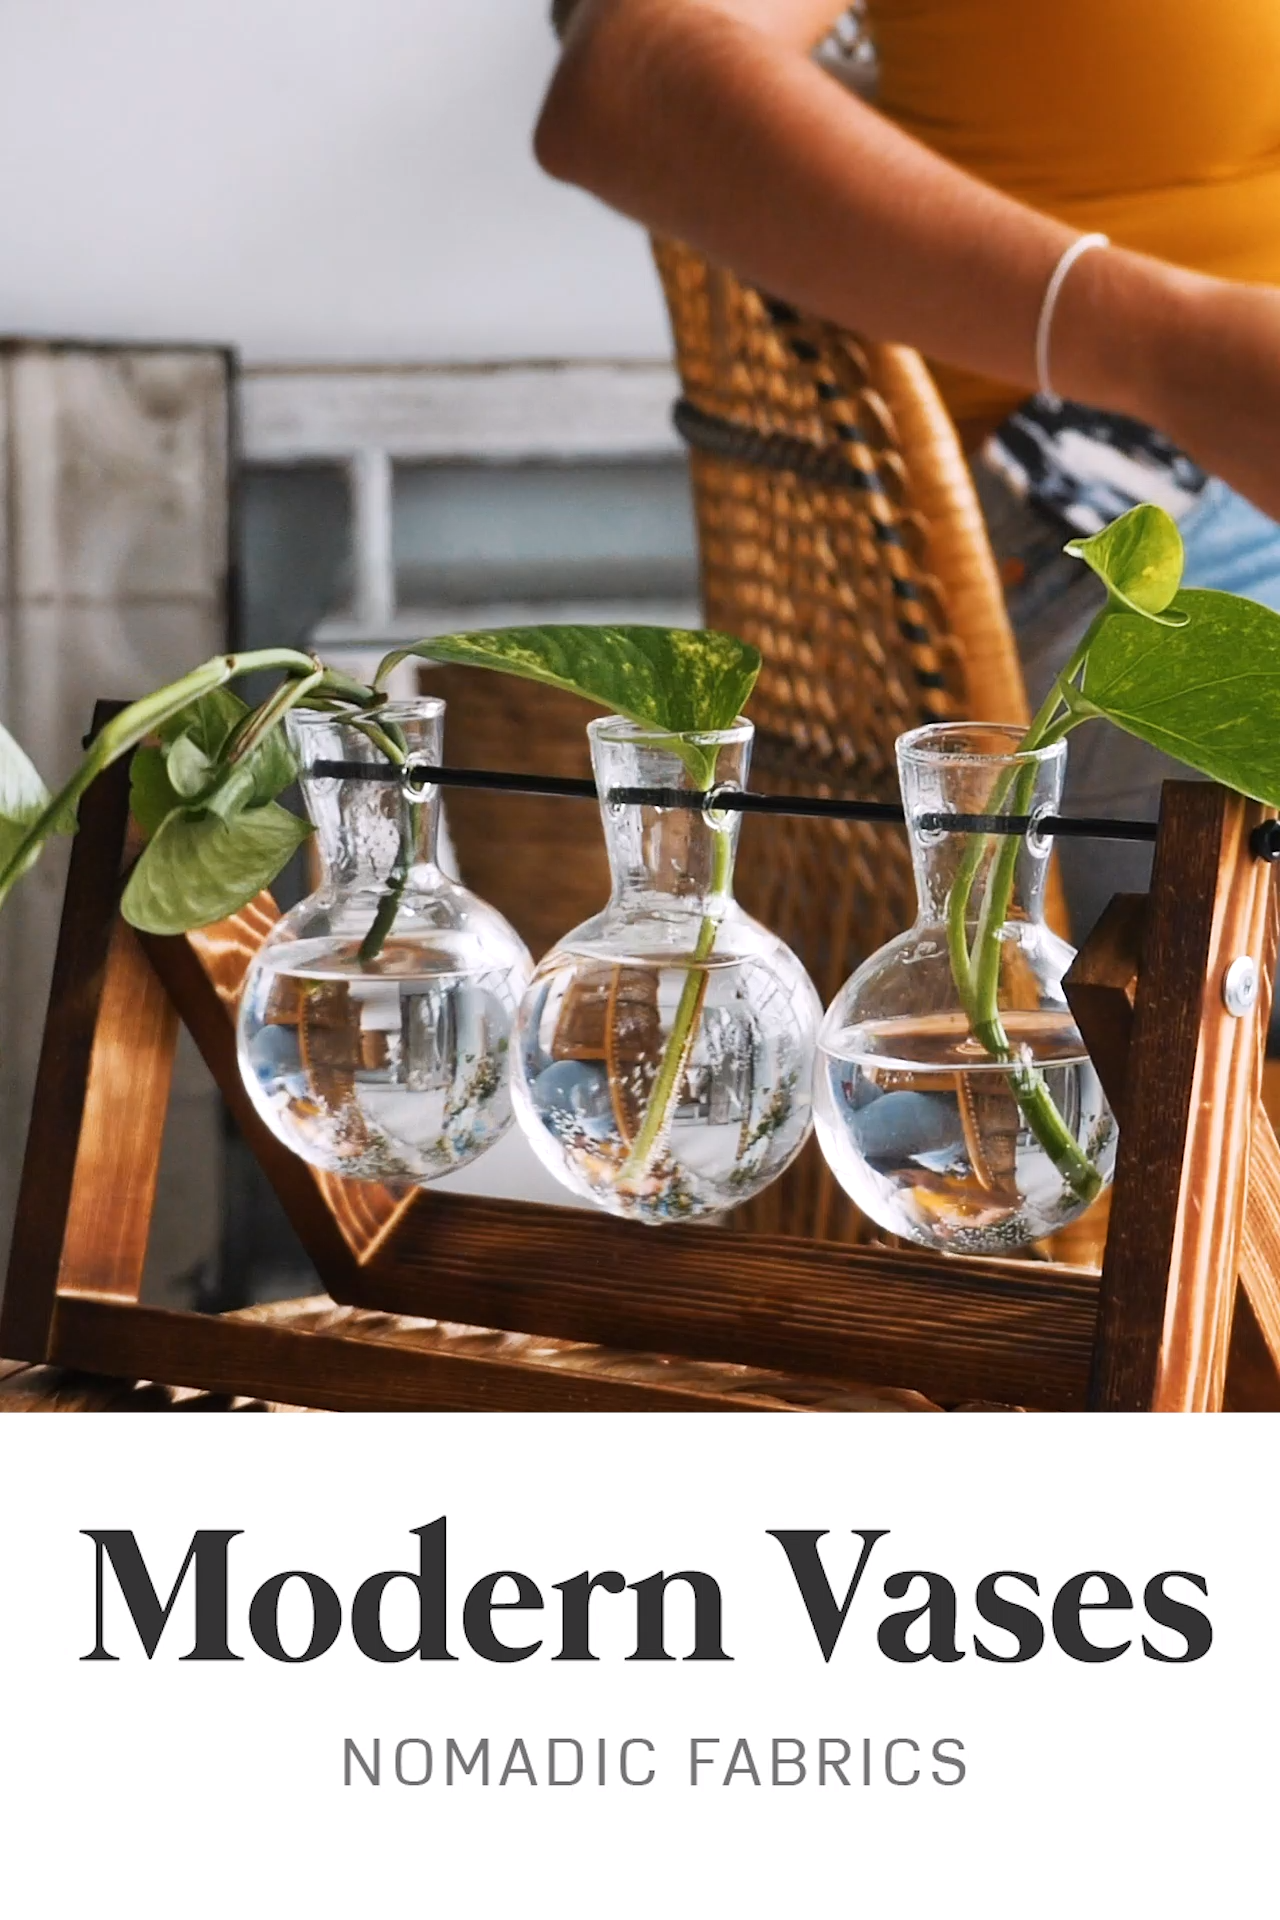 Nomadic Fabrics Hydro Vases -   19 diy Interieur plants ideas